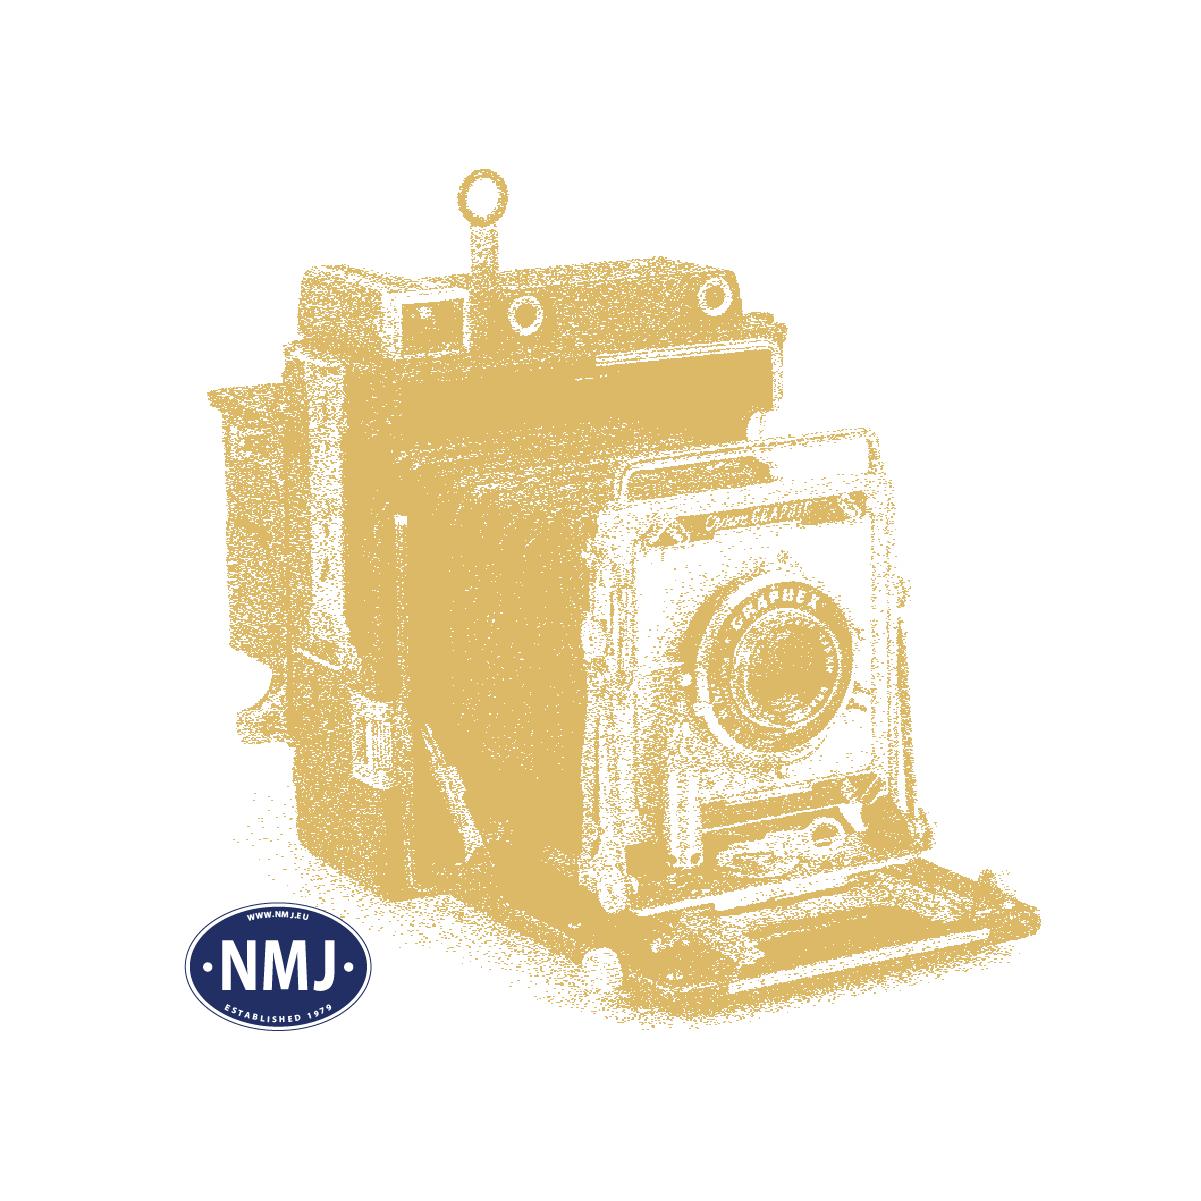 NMJT84.301 - NMJ Topline NSB BM69A.011, DC